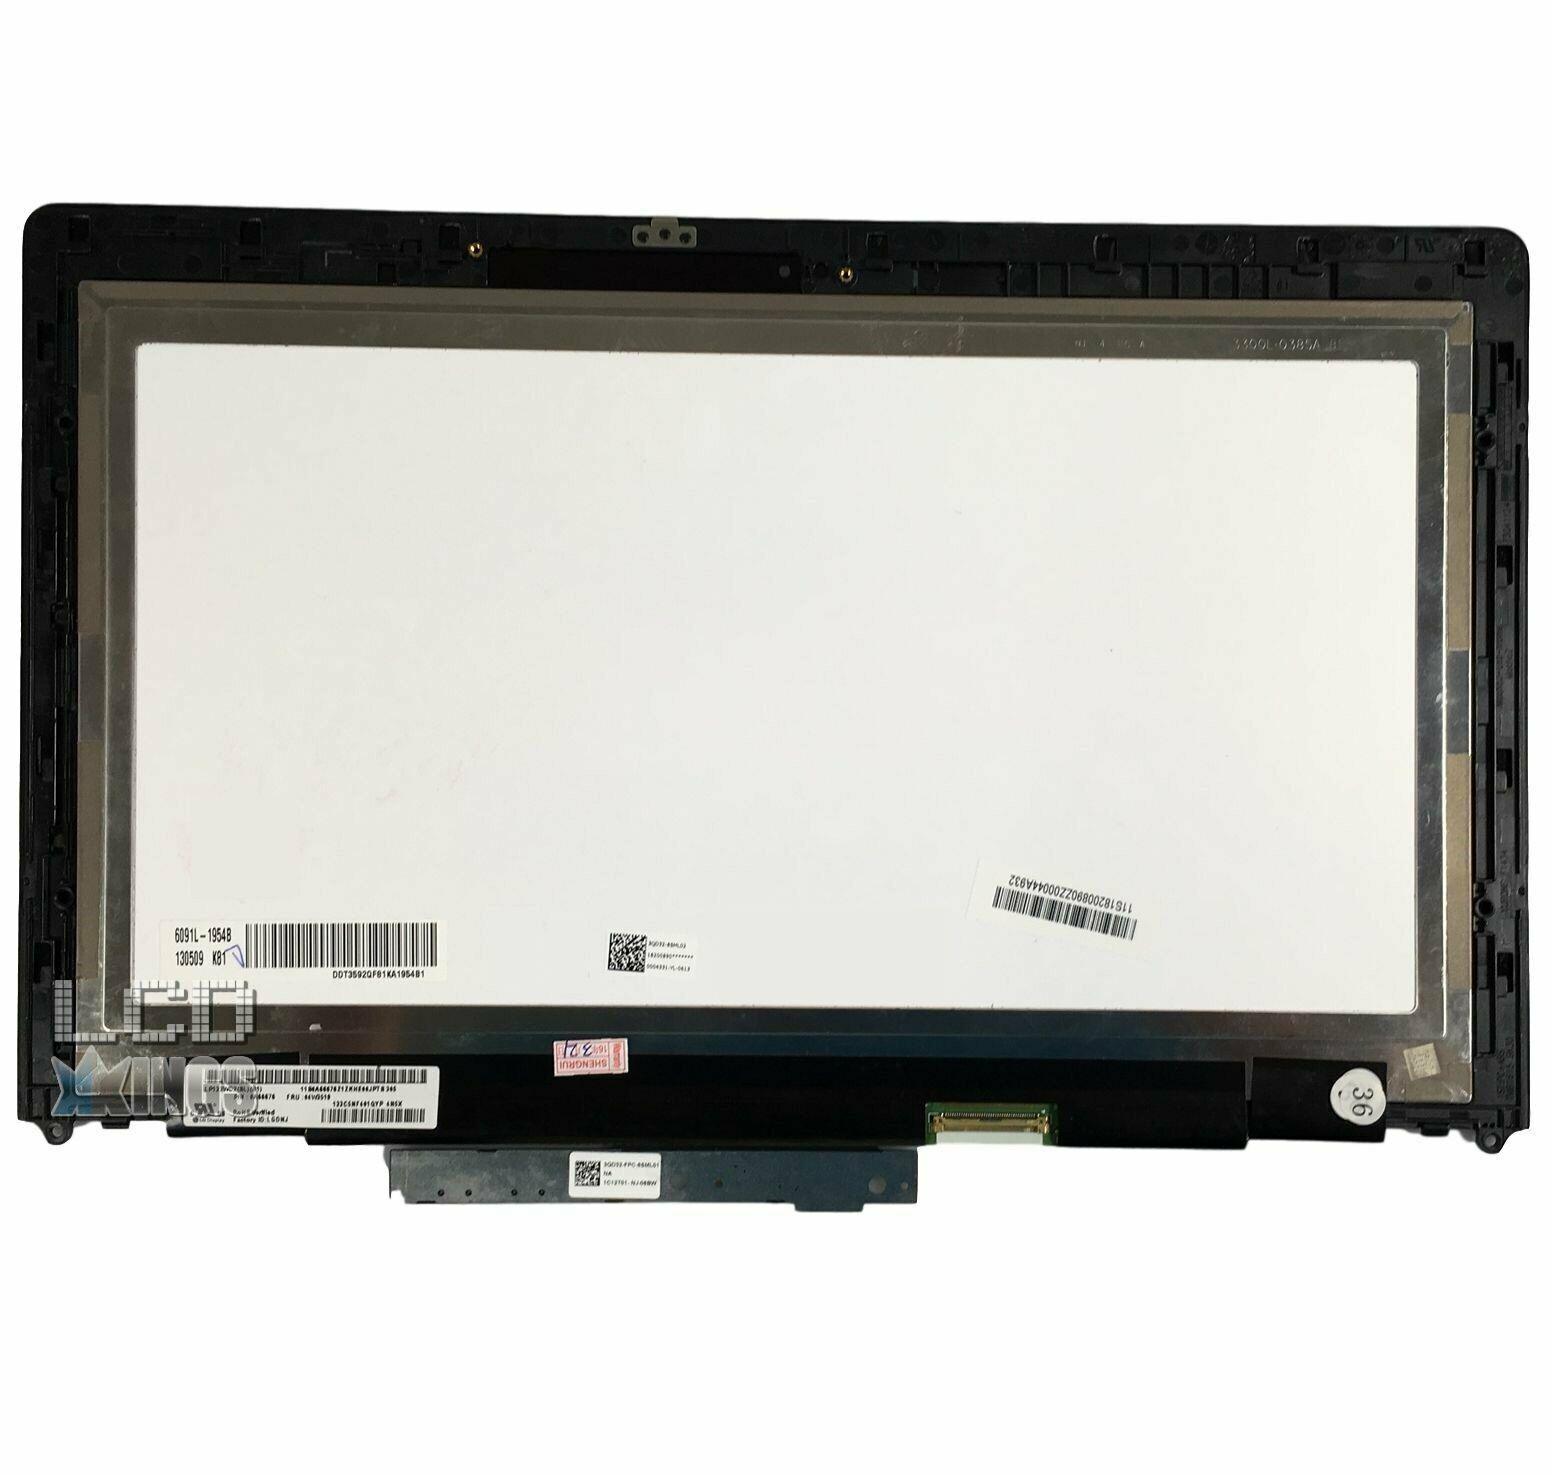 Lenovo Ideapad Yoga 13 35008407 Screen Digitizer Assembly and Frame UK Supply